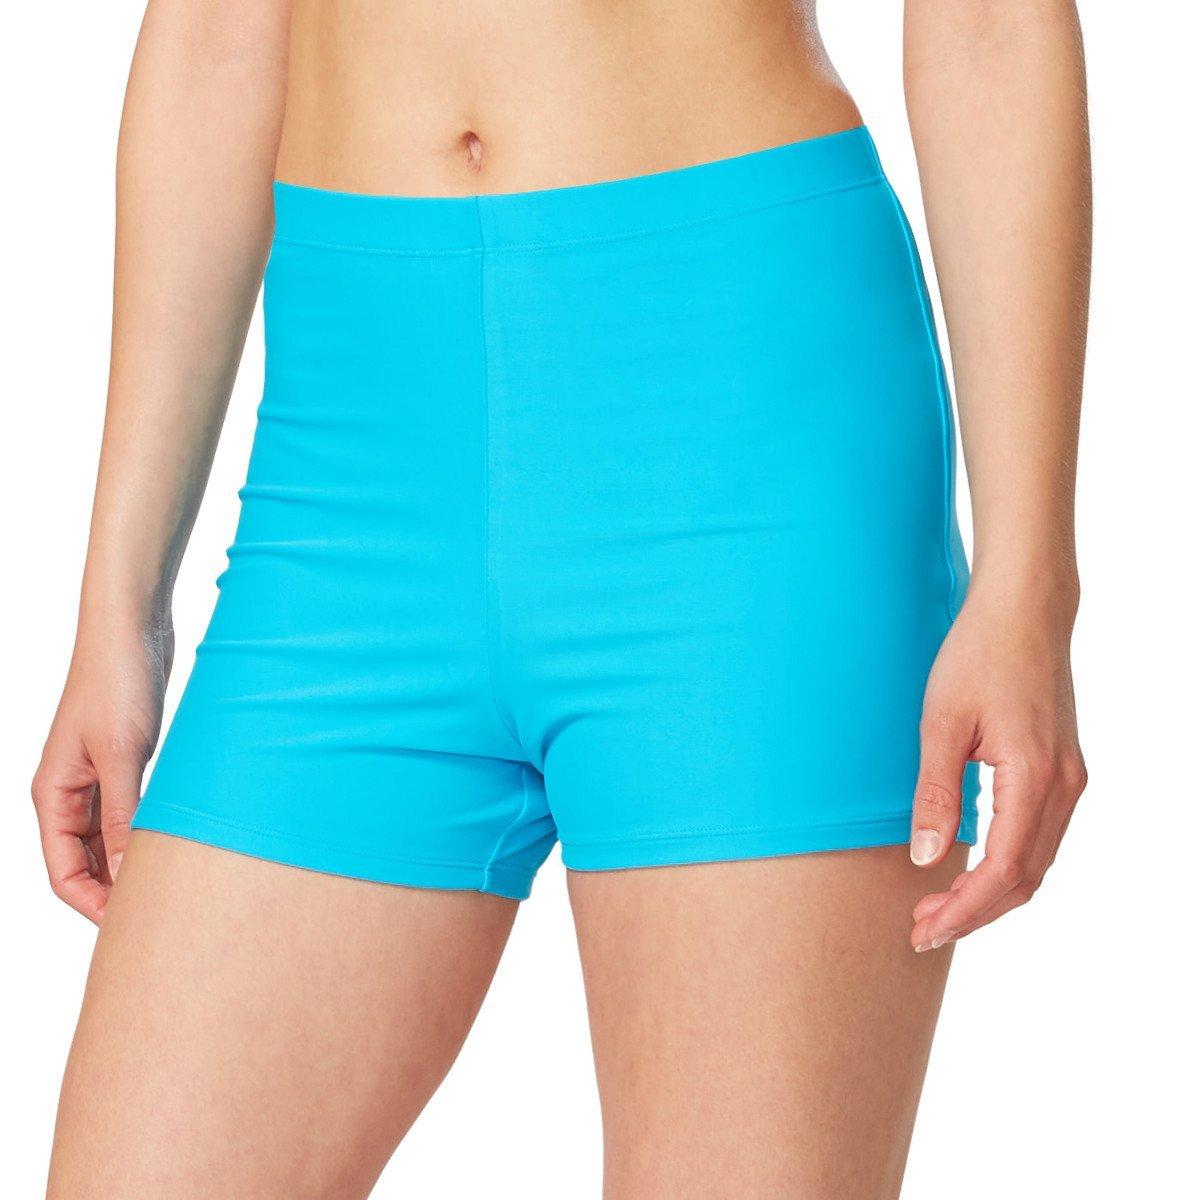 4a7dc81fa32 Baleaf Women s Basic High Waisted Boy Short Swim Bikini Tankini Bottom with  Liner Blue Size M